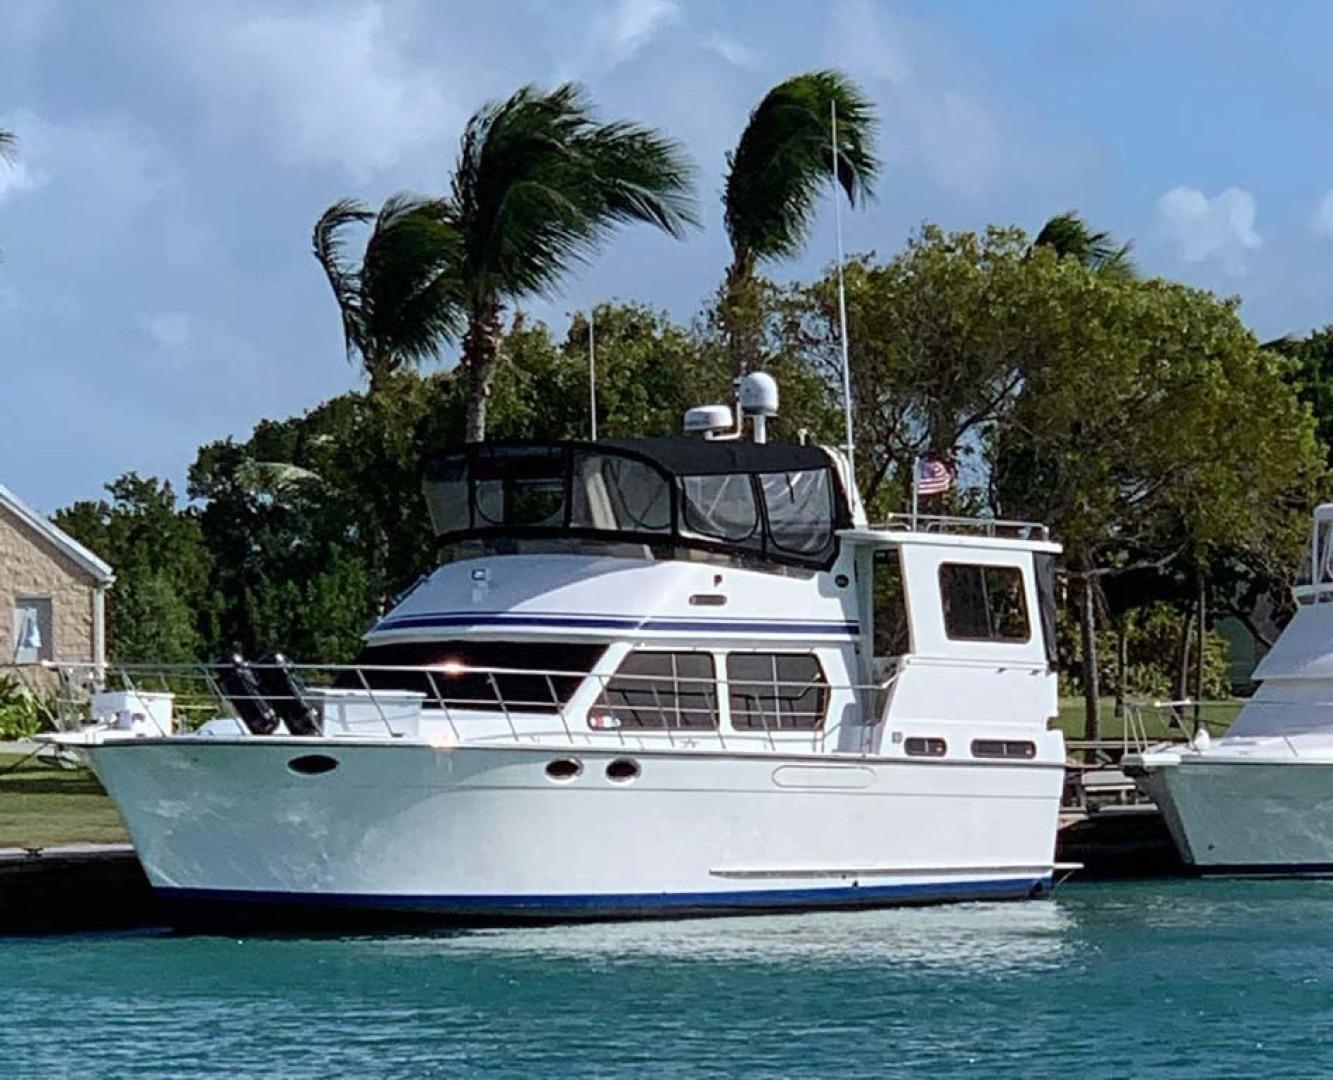 Aquarius-45 1988-Great Escape Coral Gables-Florida-United States-Profile-1343582 | Thumbnail